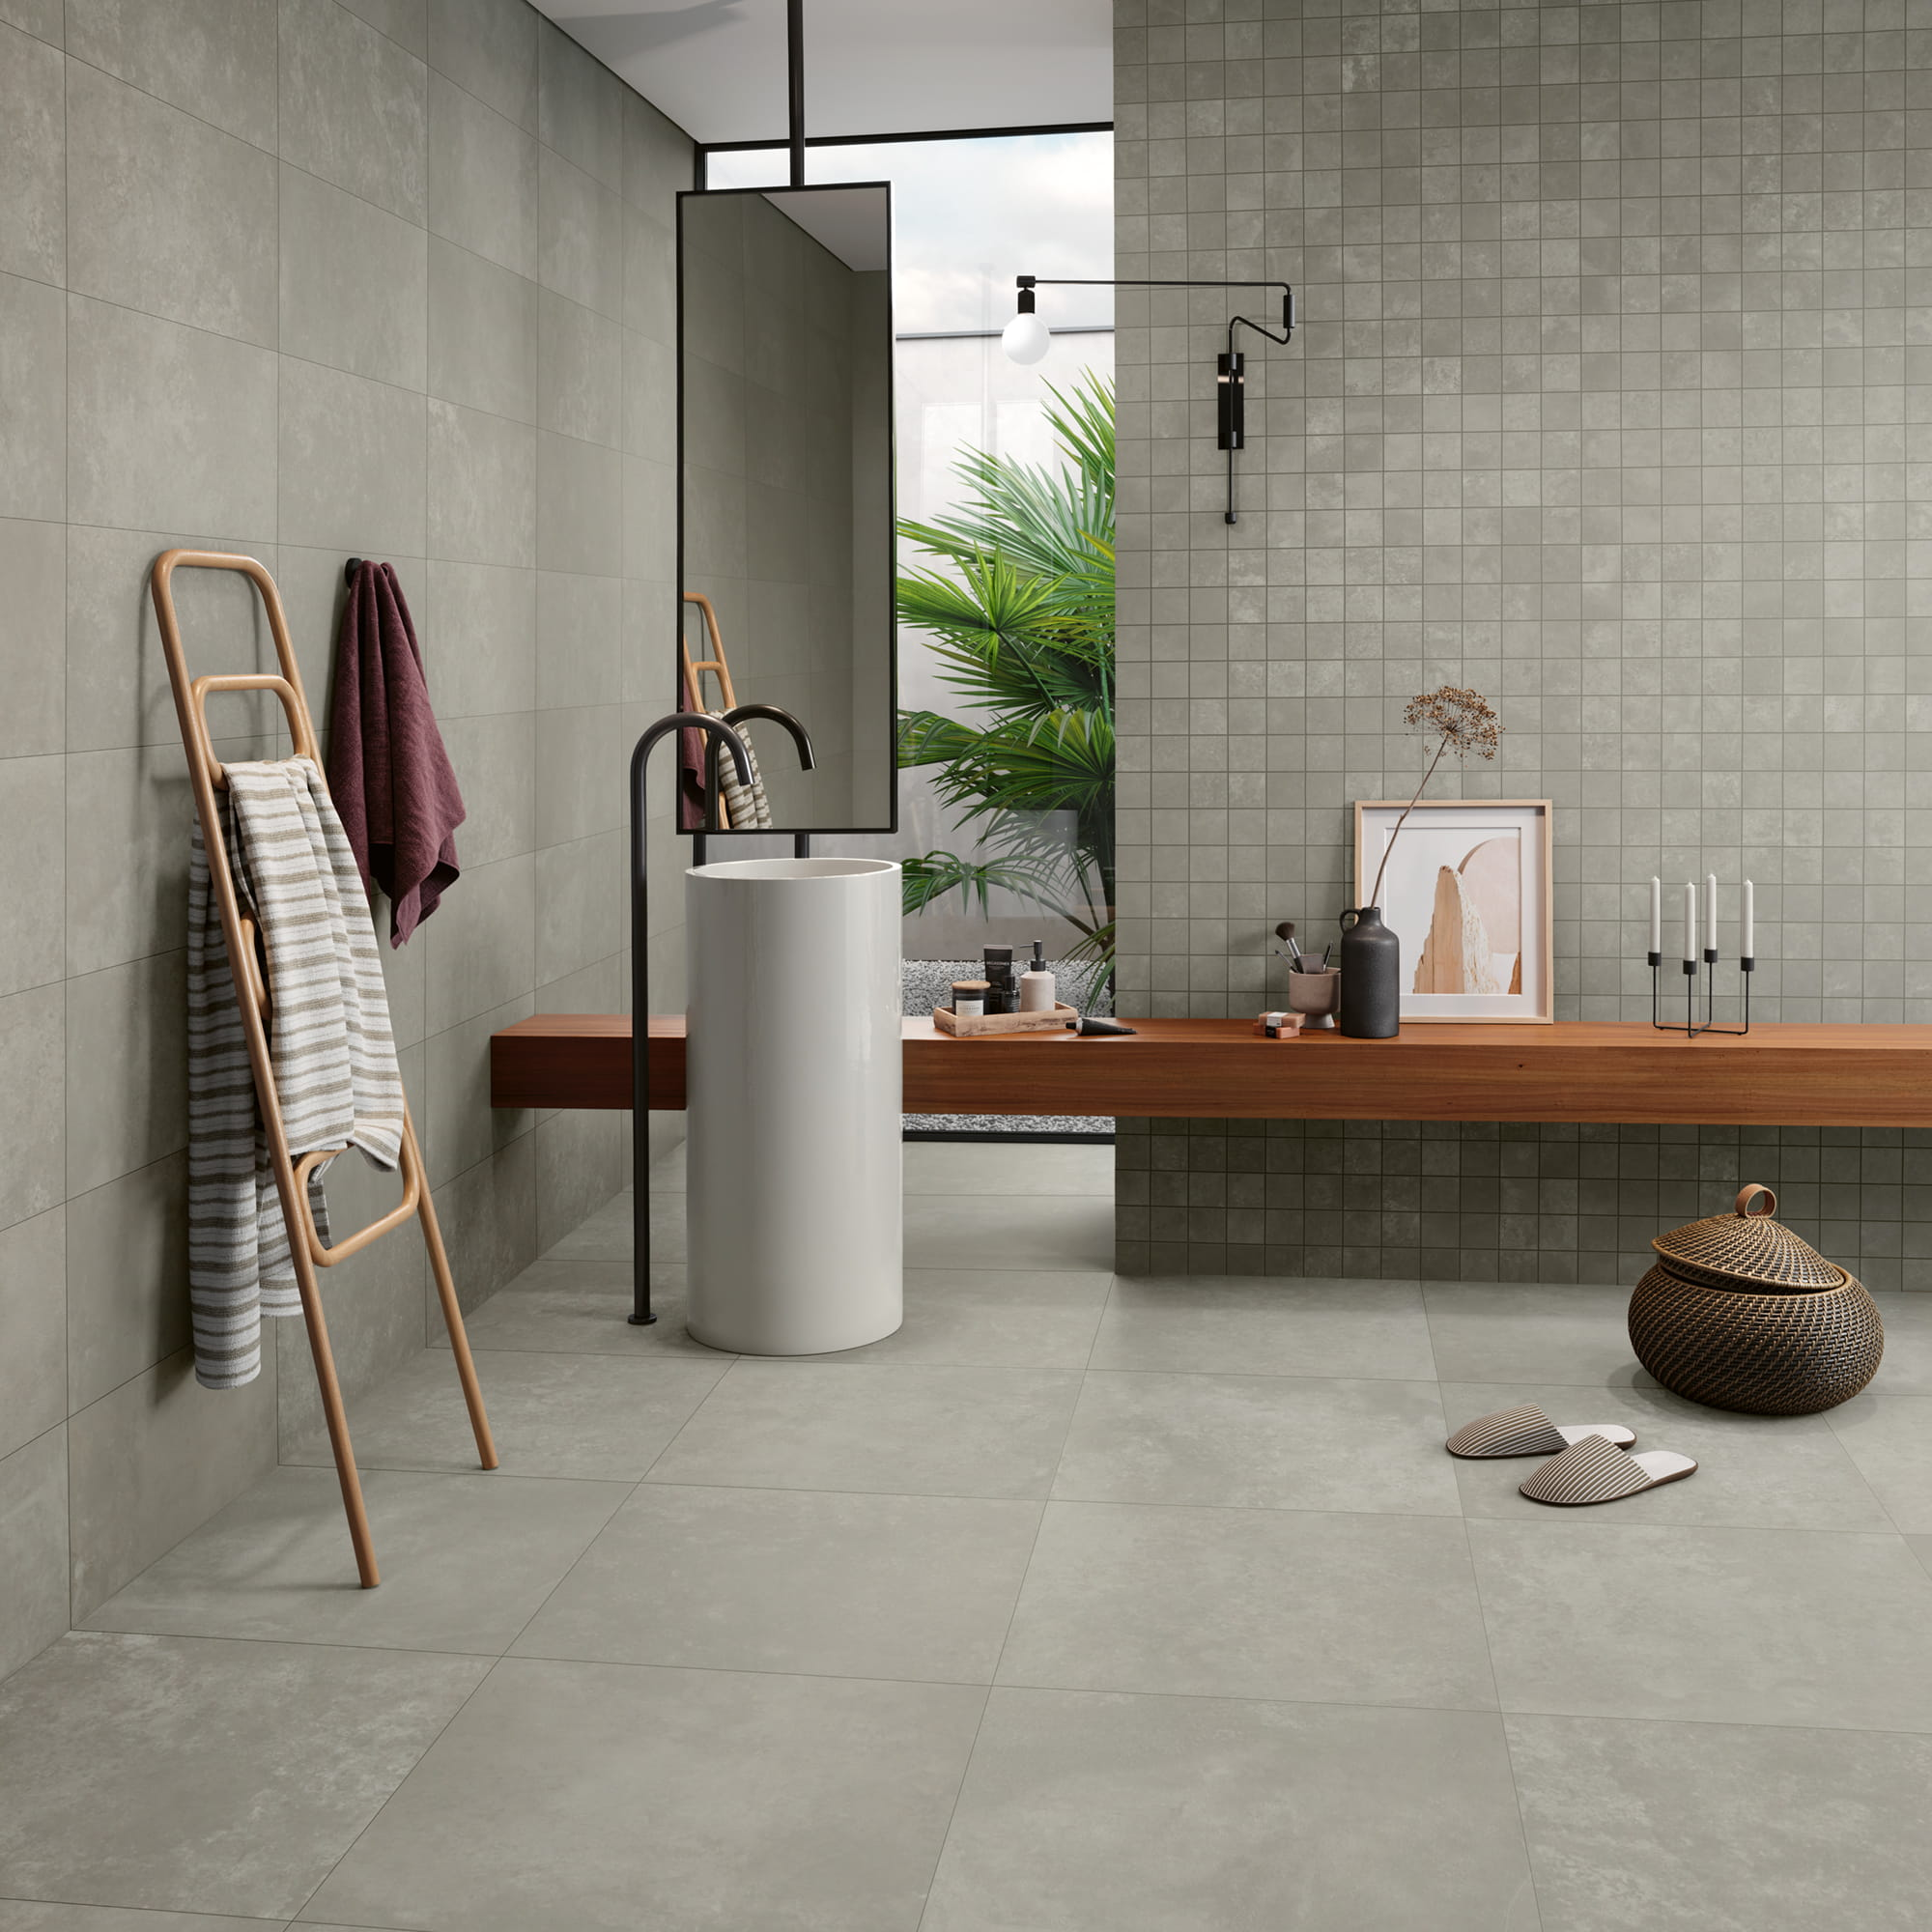 Balance Grey - 30 x 60 RET. Touch | Mosaic Balance Grey - 30 x 30 Touch | Balance Grey - 60 x 60 RET. Touch